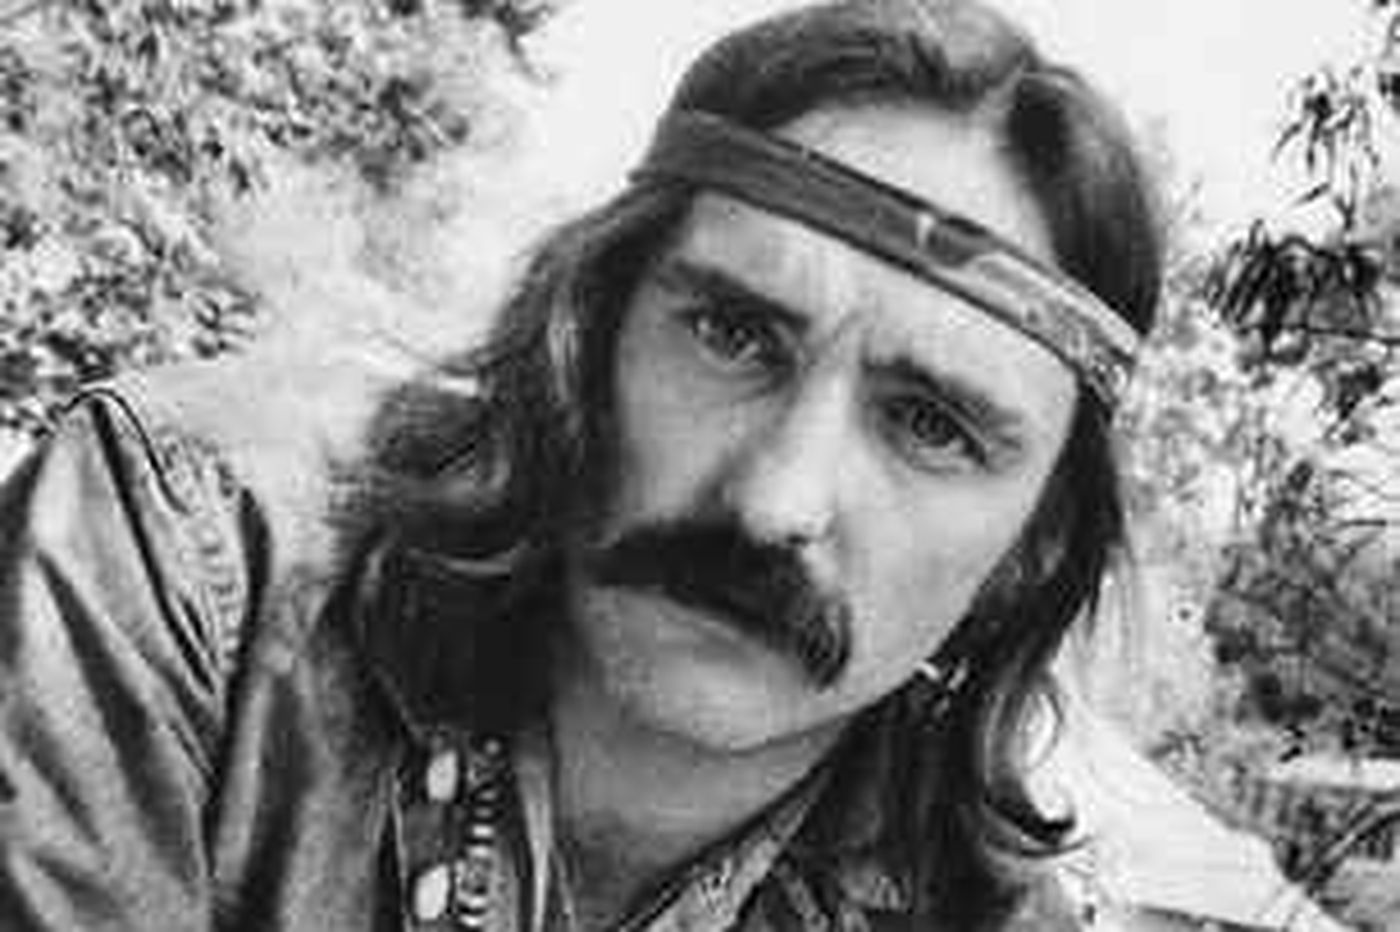 Dennis Hopper, 74, 'Easy Rider' star, dies